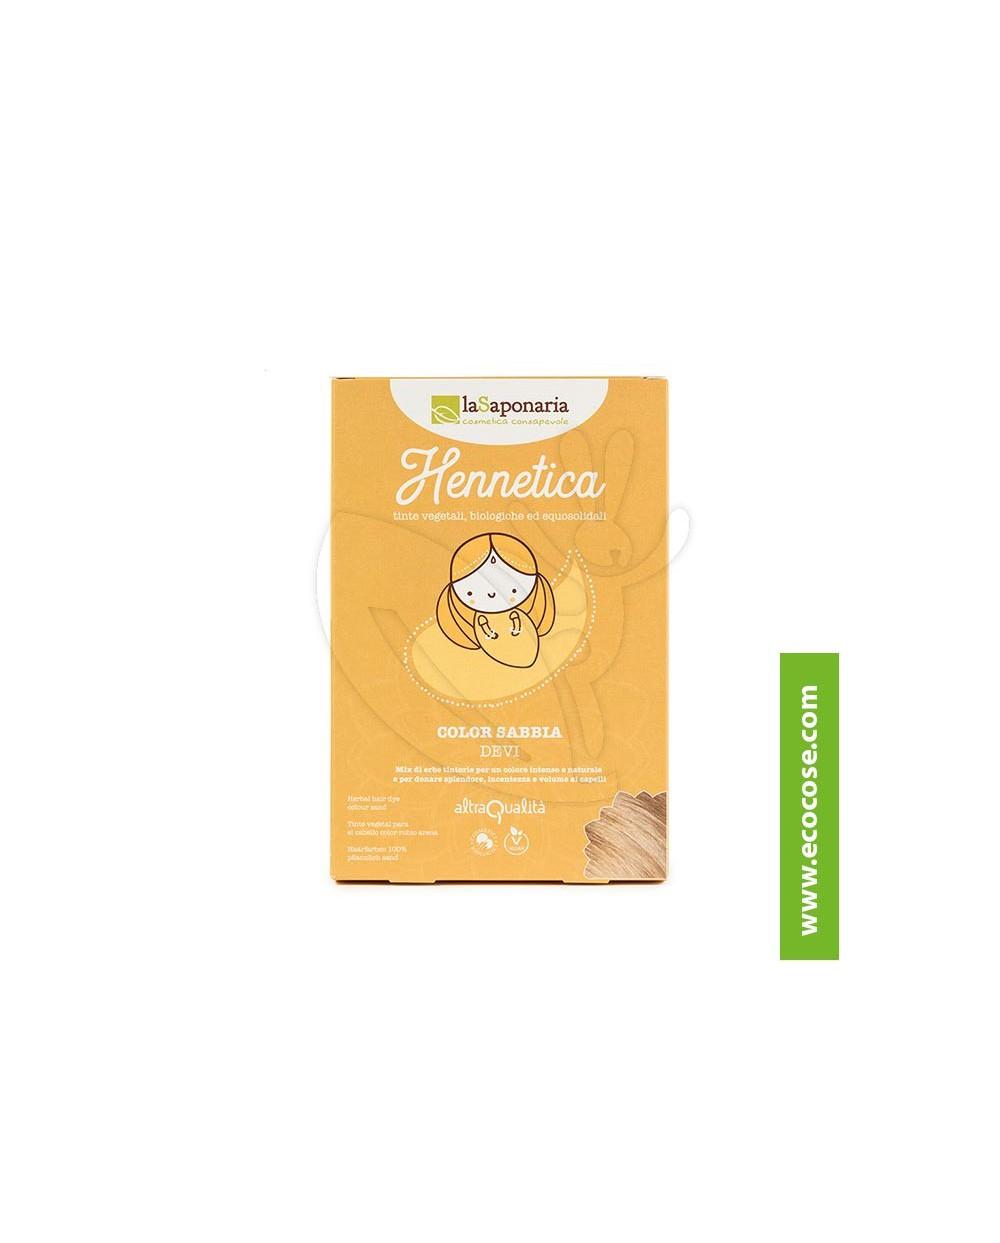 La Saponaria - Hennetica - Tinta vegetale sabbia Devi